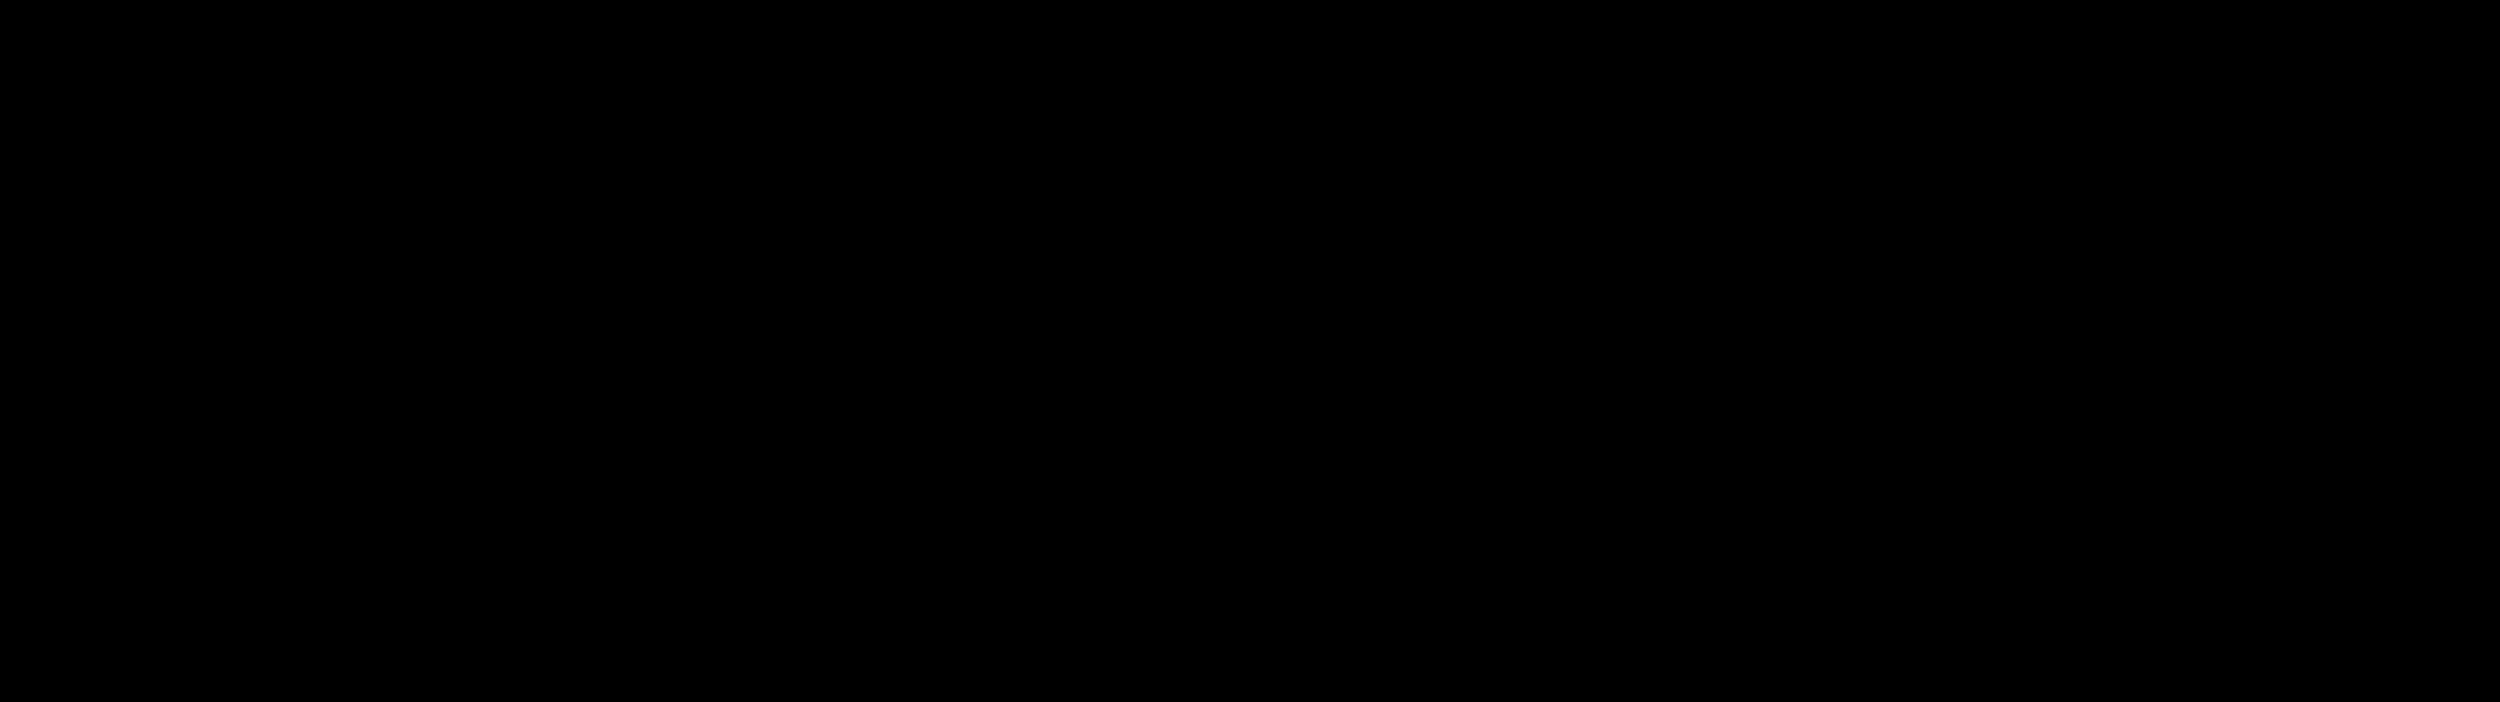 GATE_RGB_black_transparent.png